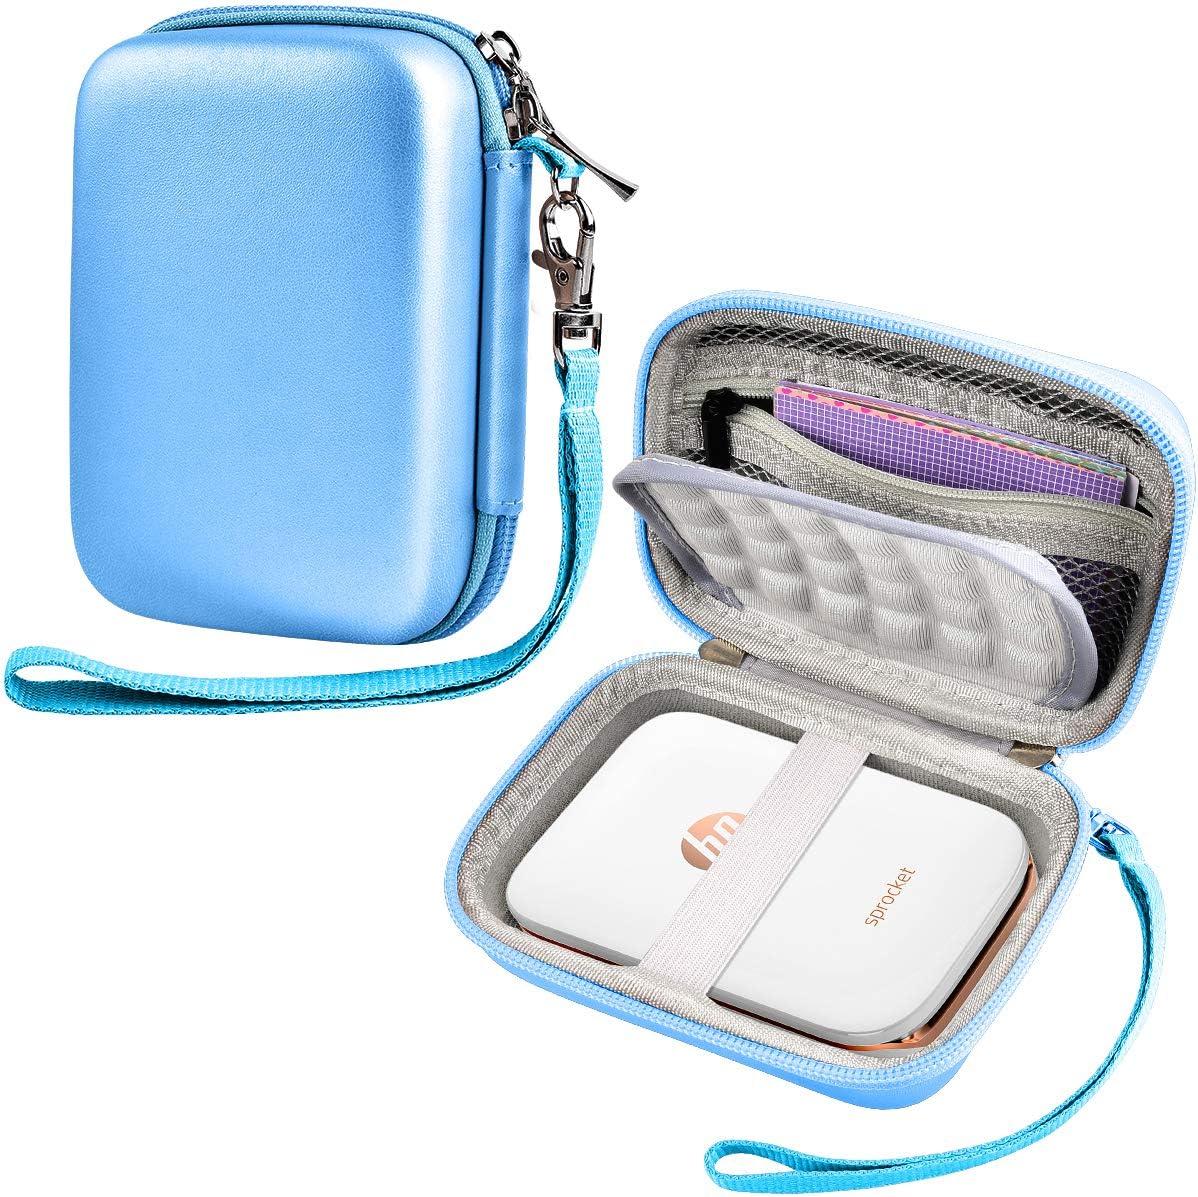 SAIKA Carrying Case Compatible with HP Sprocket Portable Photo Printer (2nd Edition) / Polaroid Zip Mobile Printer / Kodak Mini Shot Wireless 2in 1 / Lifeprint 2x3 Portable Box - Blue